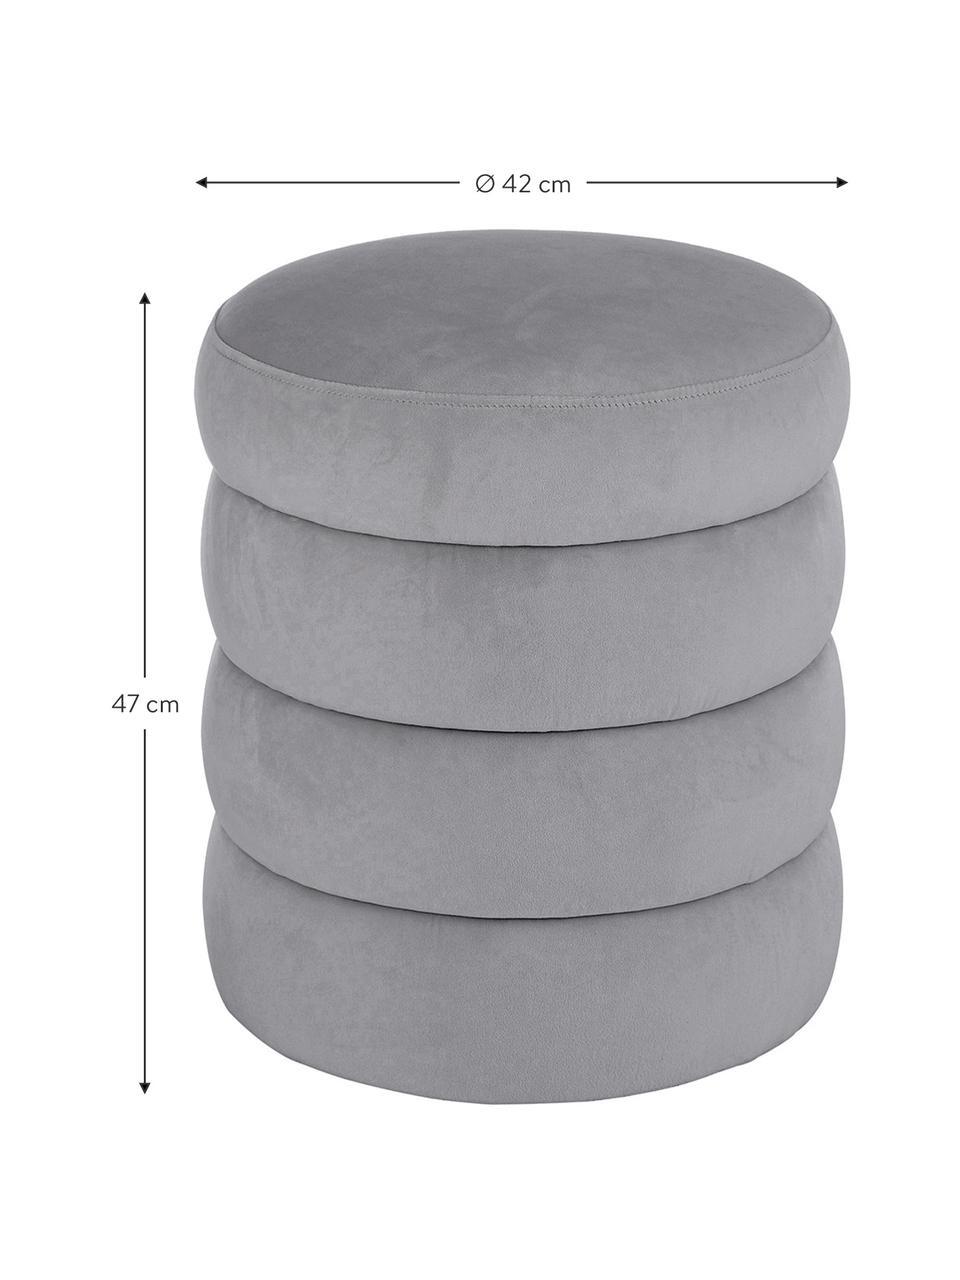 Samt-Hocker Alto, Bezug: Samt (Polyester) 30.000 S, Gestell: Sperrholz, Samt Grau, Ø 42 x H 47 cm